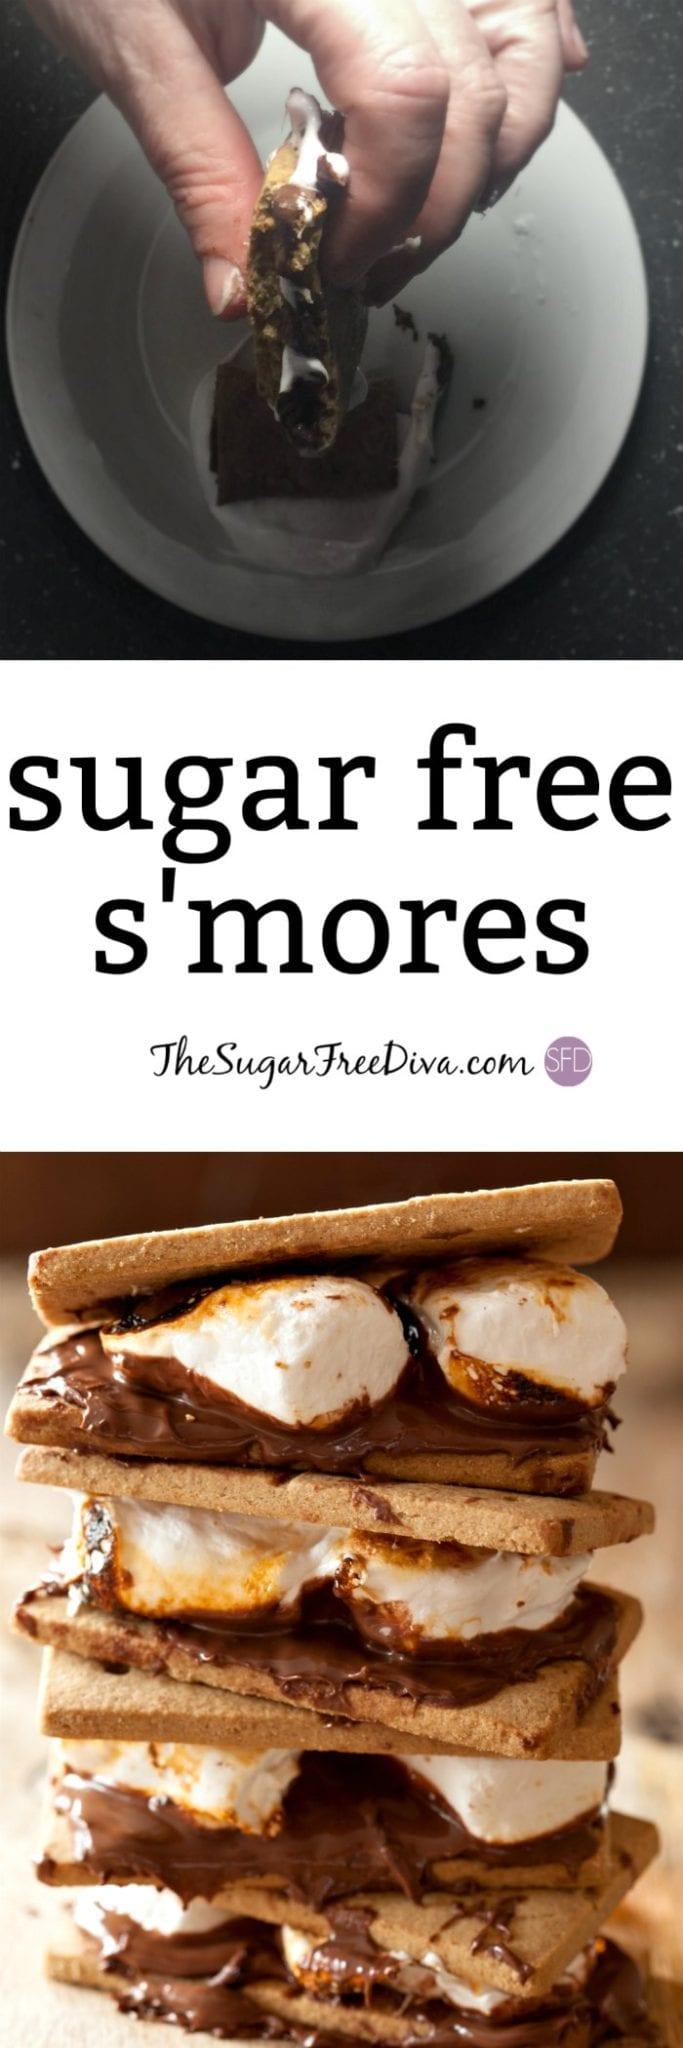 Sugar Free S'Mores